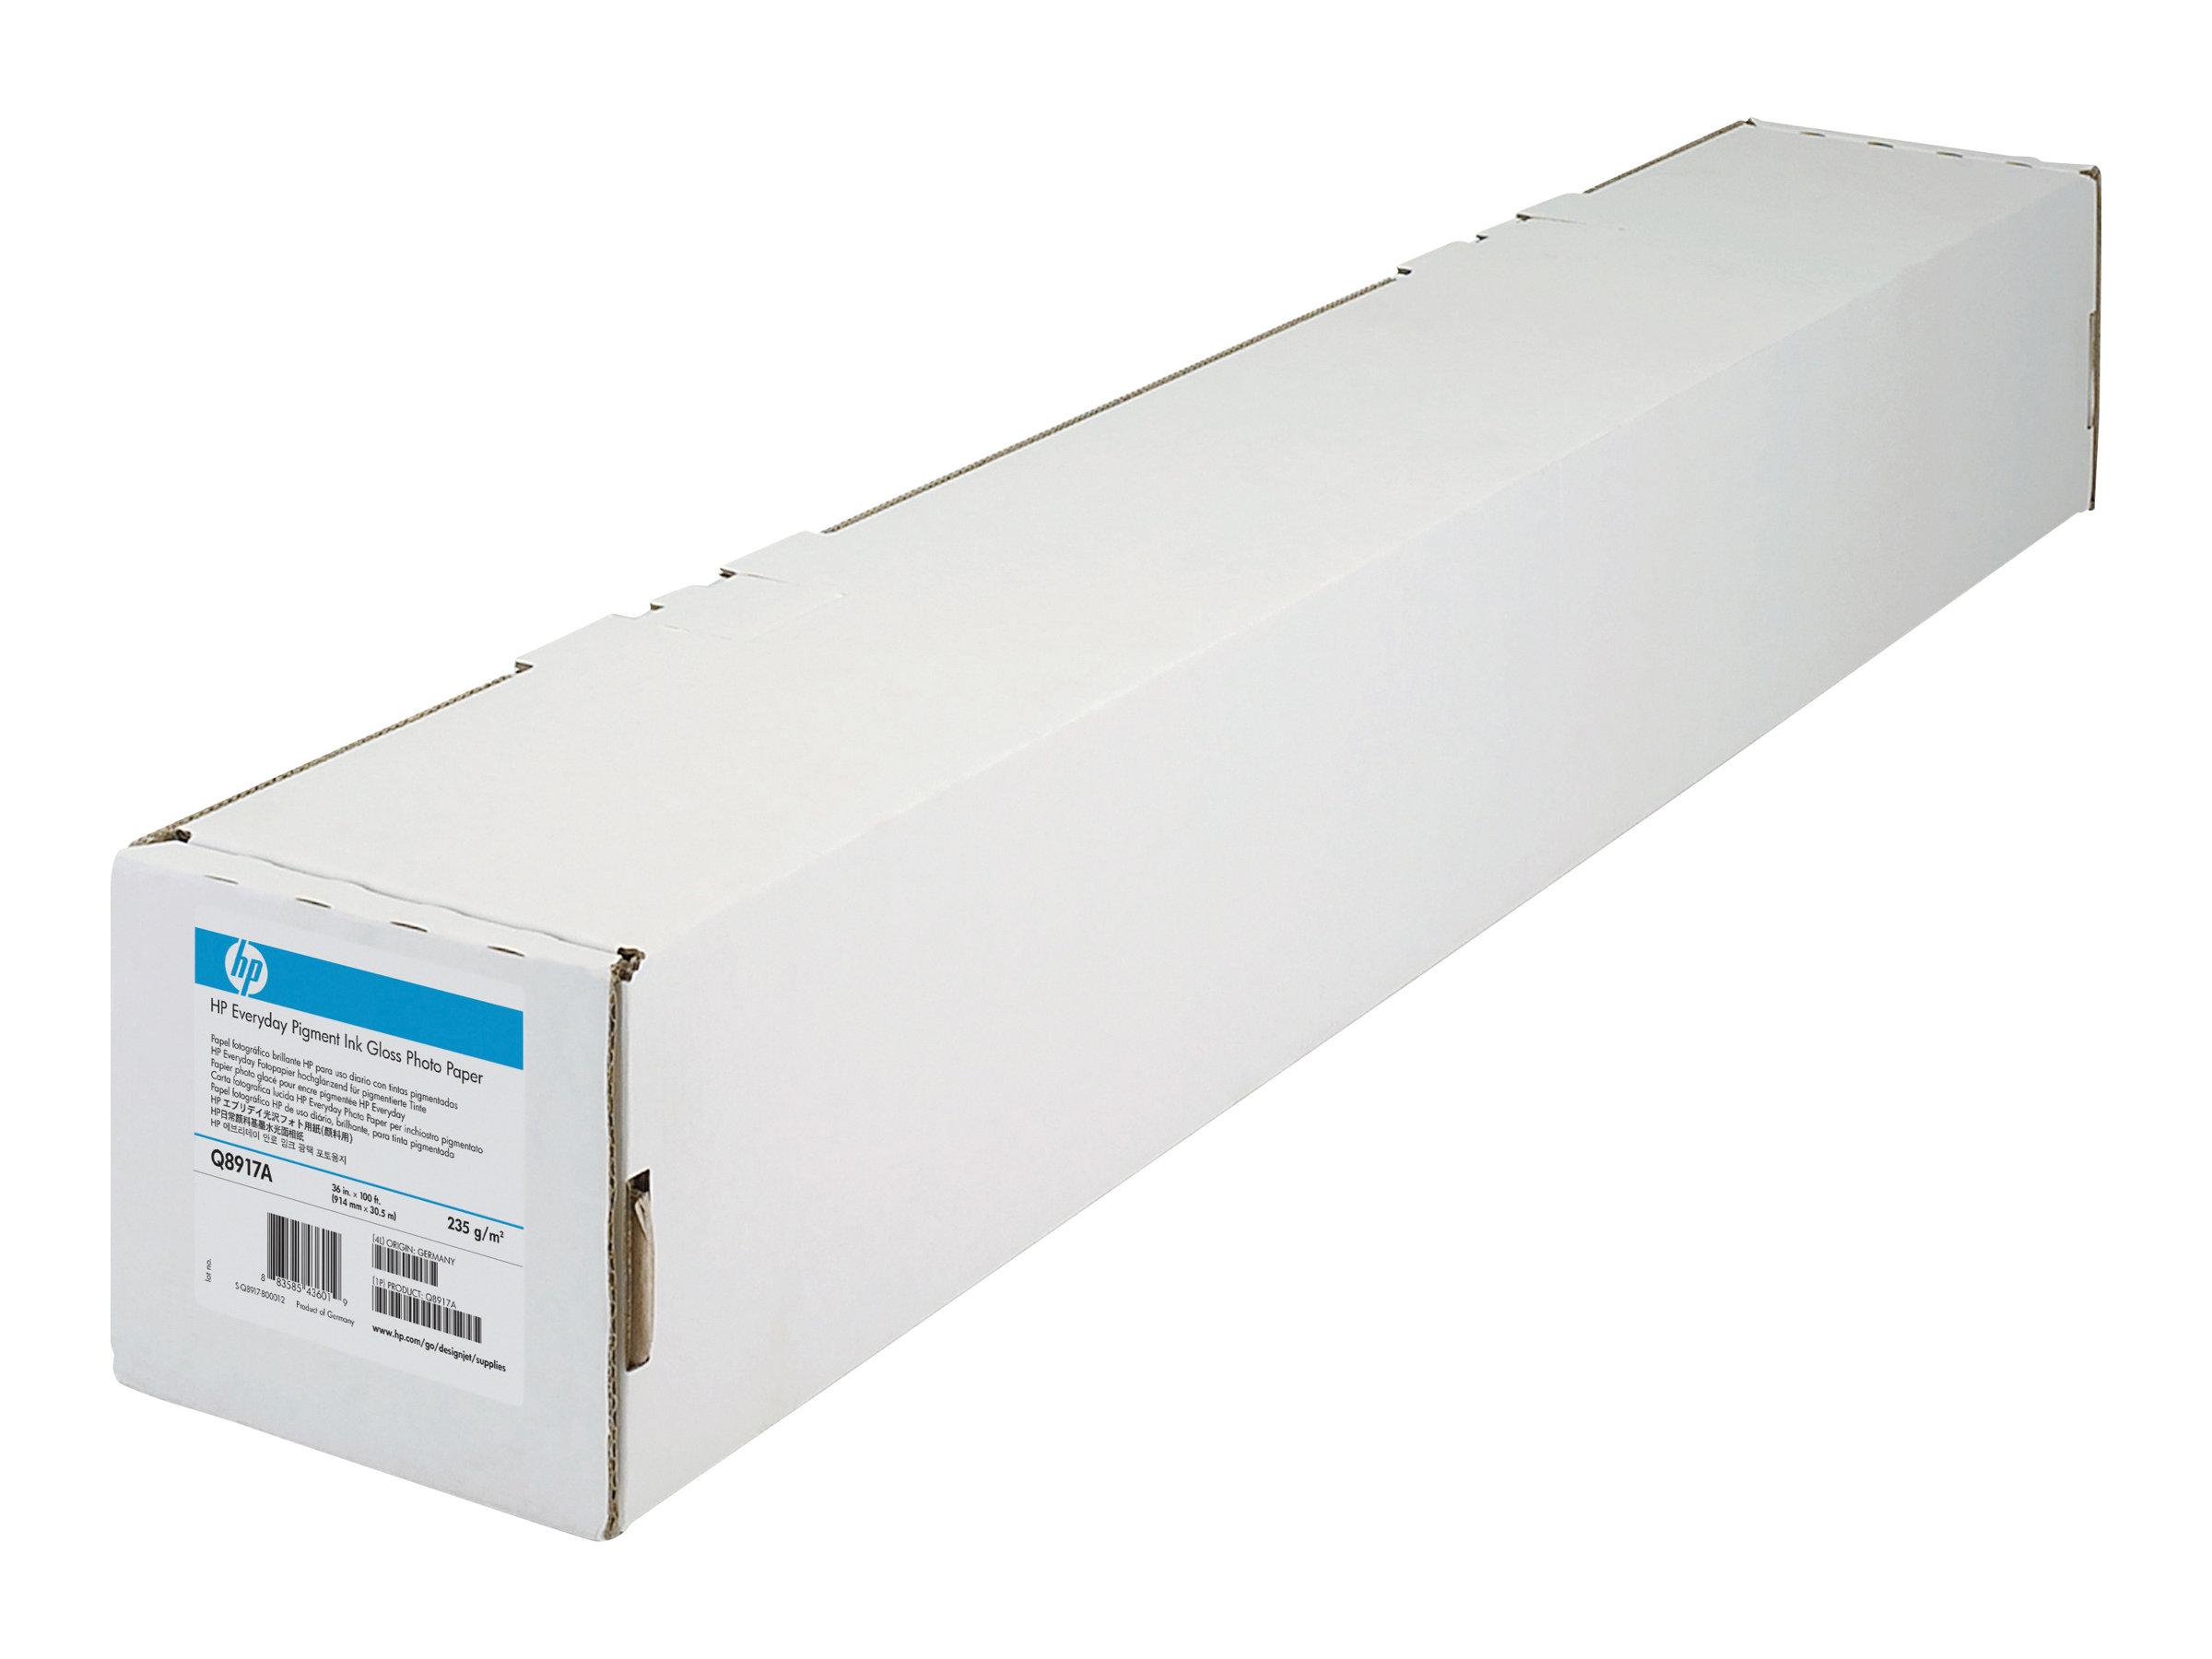 HP Universal High-gloss Photo Paper - Glänzend - Rolle (91,4 cm x 30,5 m)